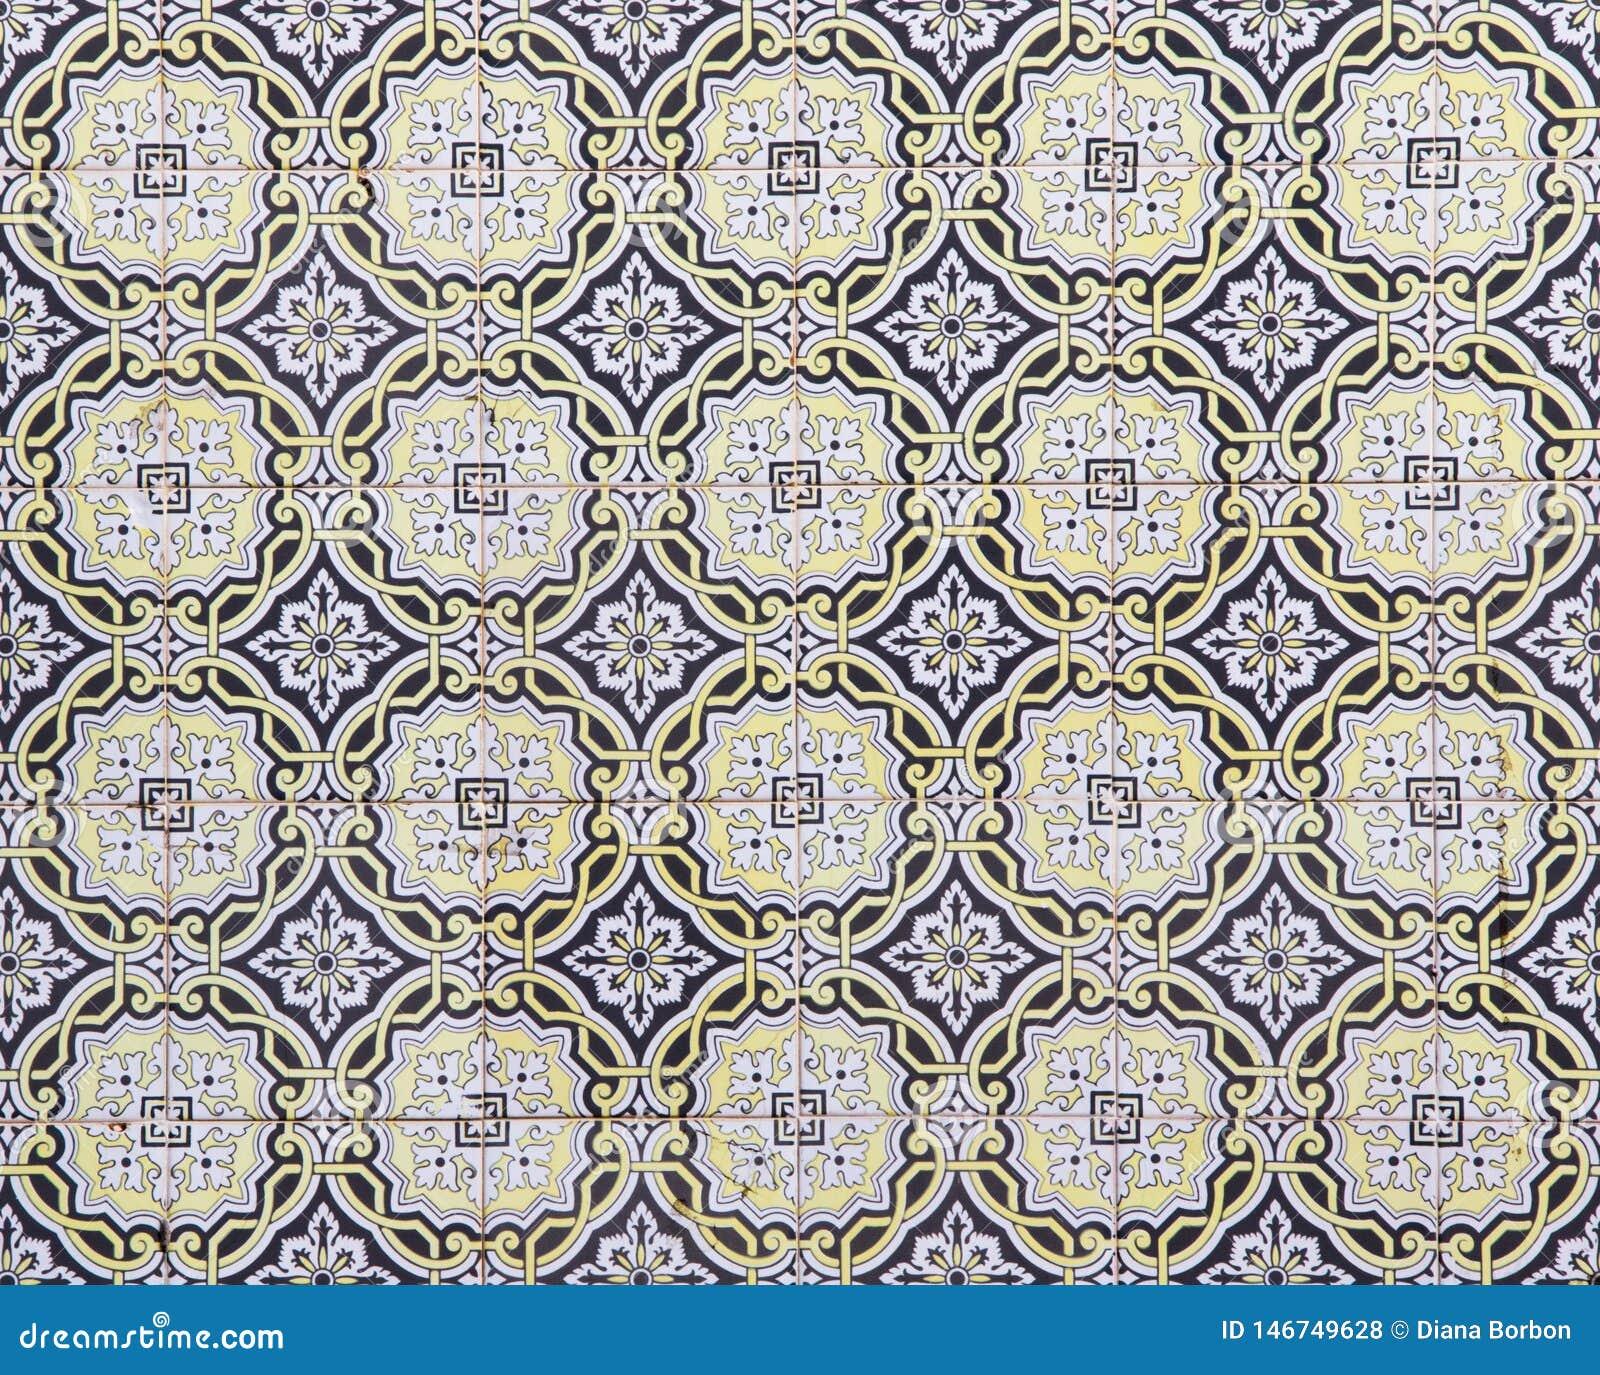 Traditionelle portugiesische Keramikfliesen, Muster